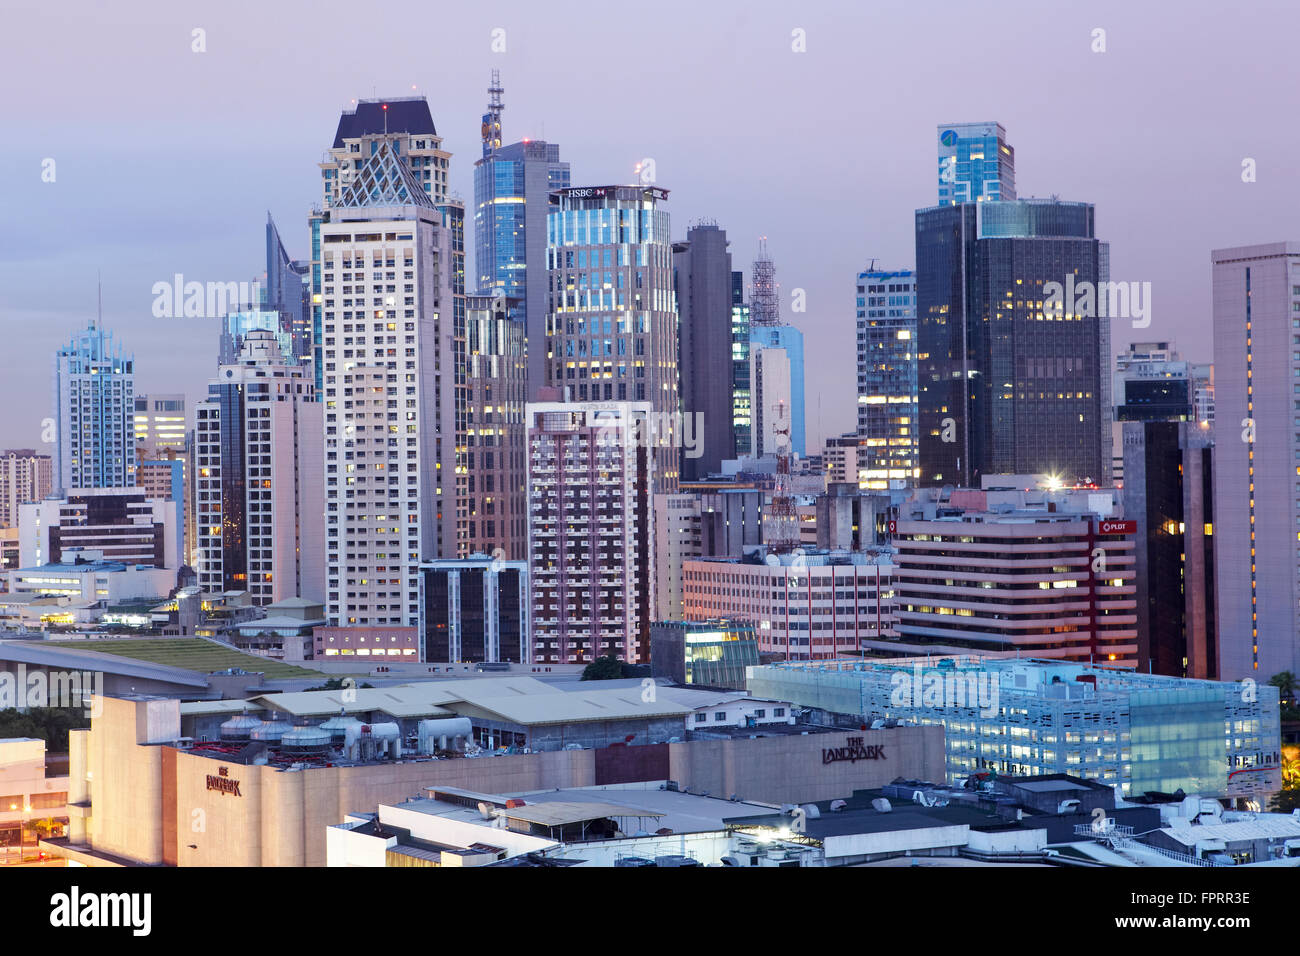 Asia, East Asia, Philippines, Manila, Makati business